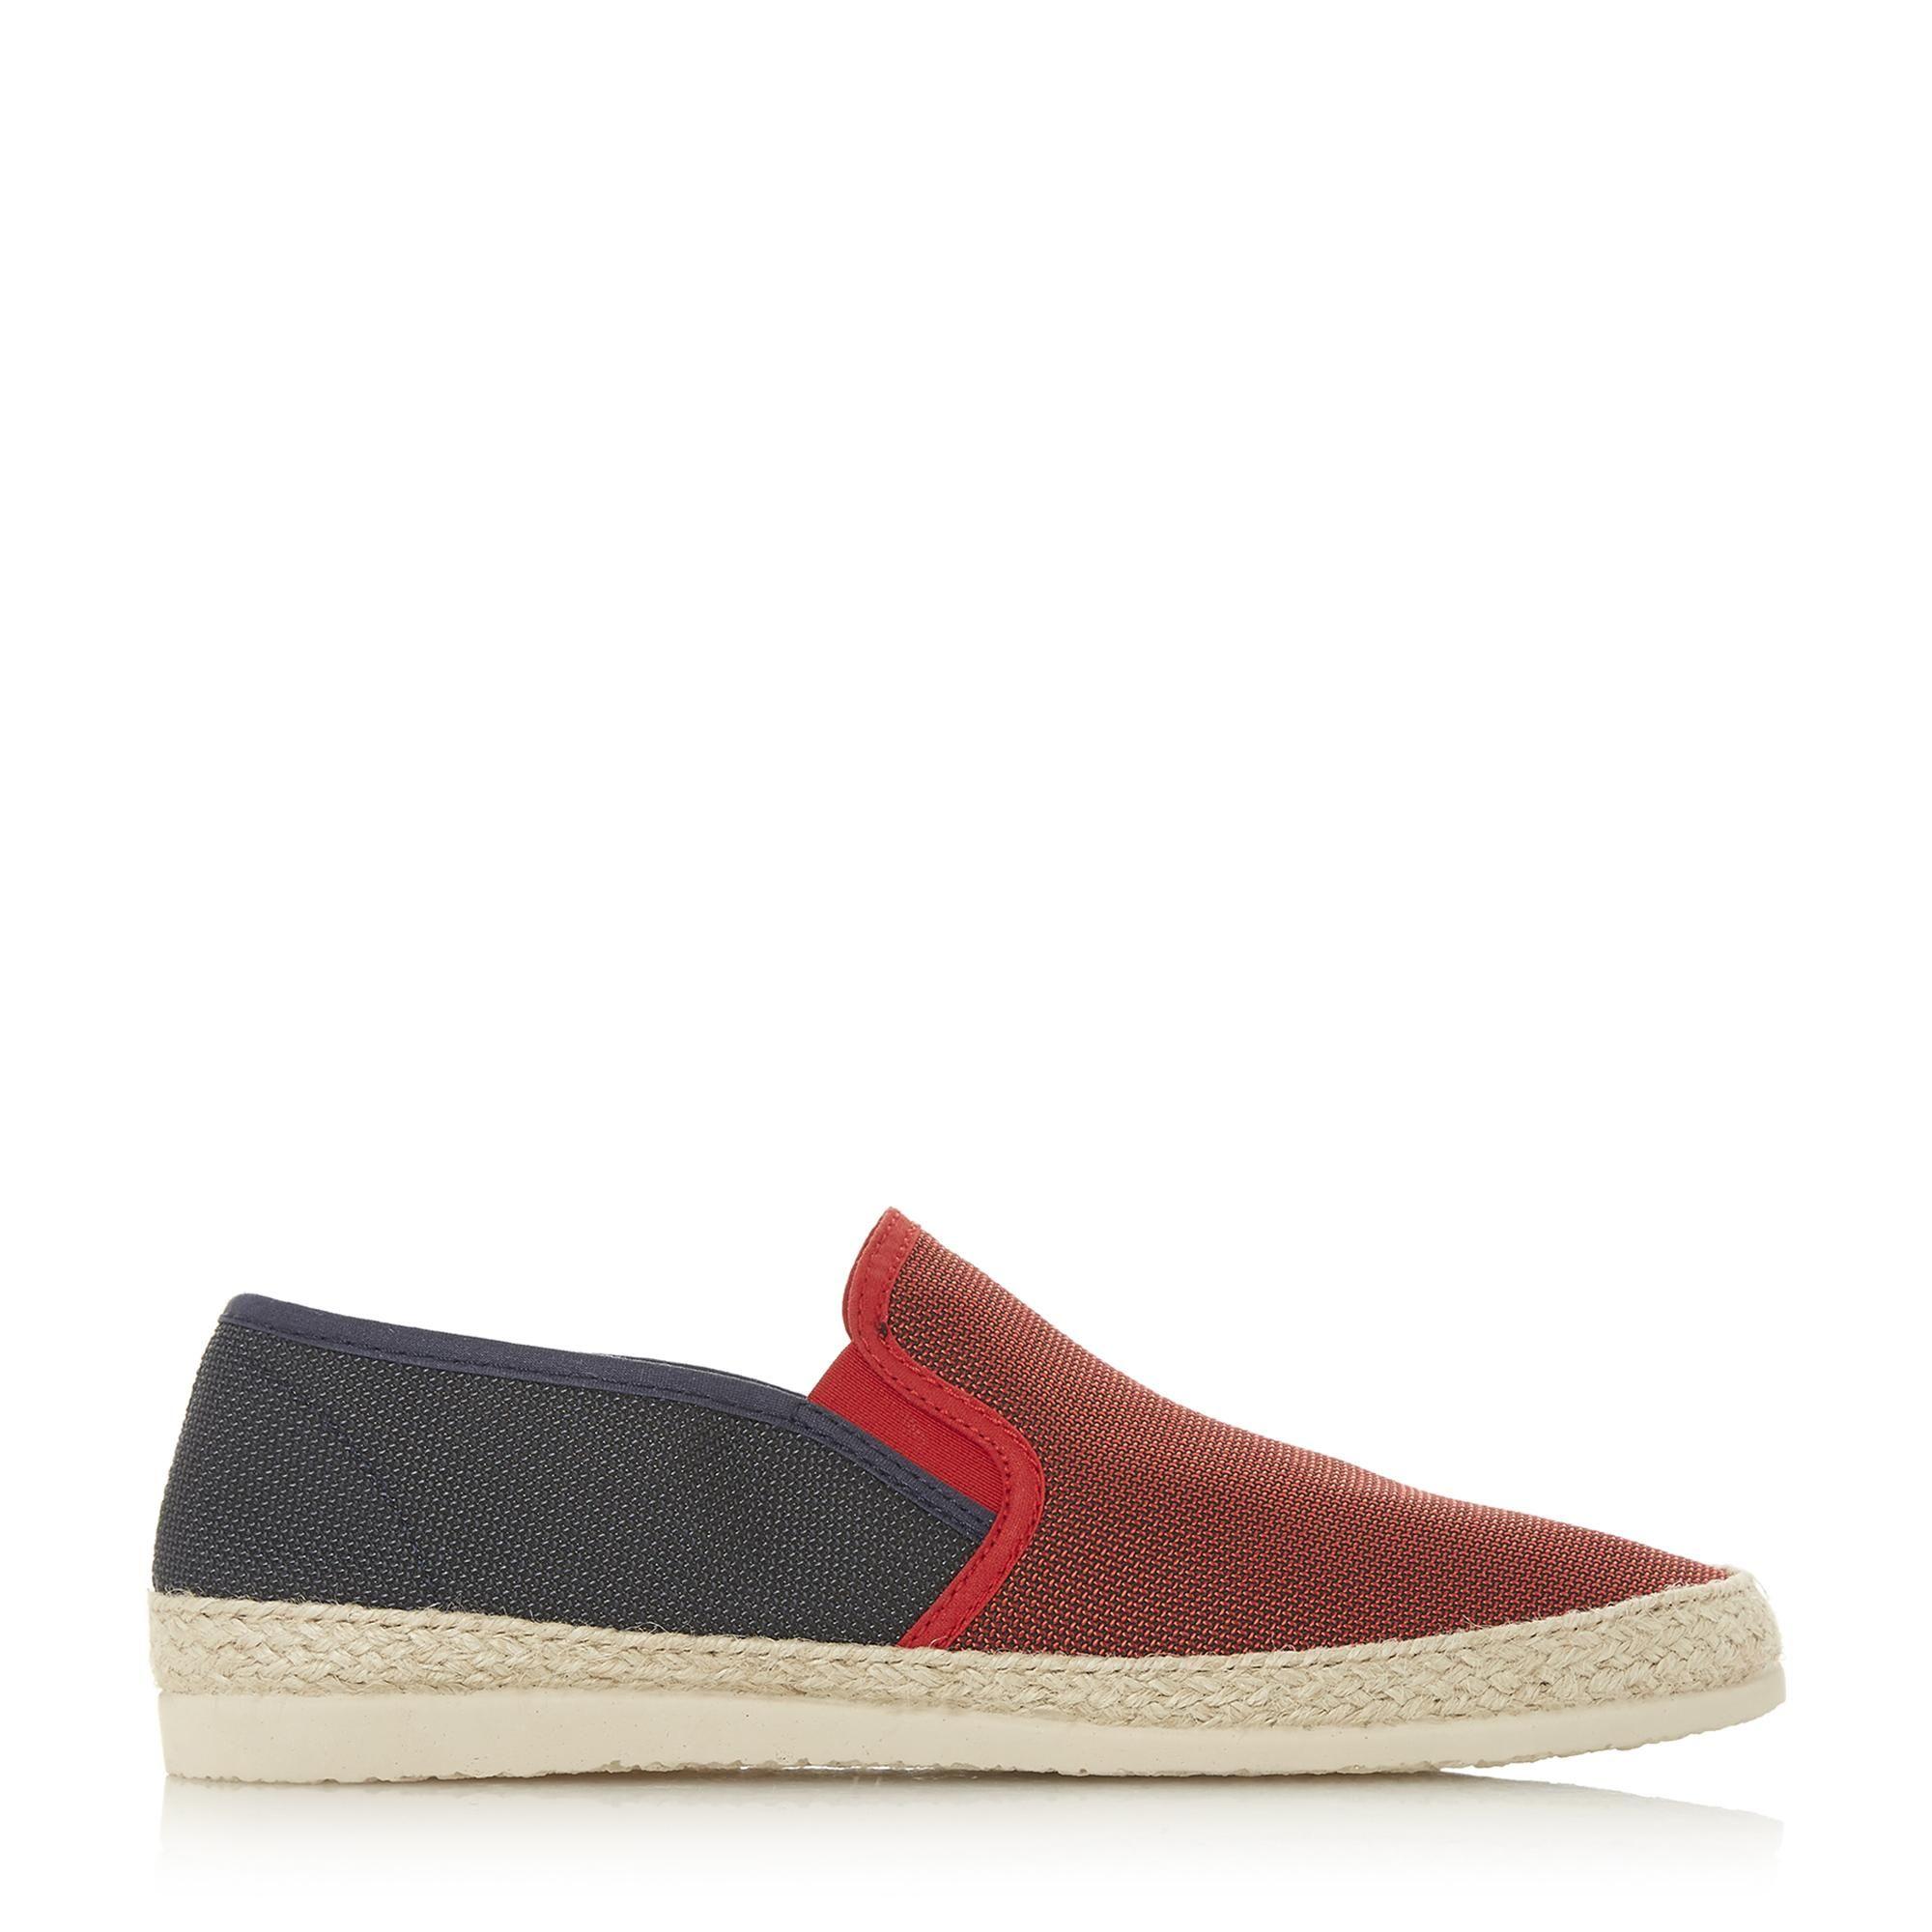 Dune Mens FINCHO Mesh Woven Espadrilles Shoes